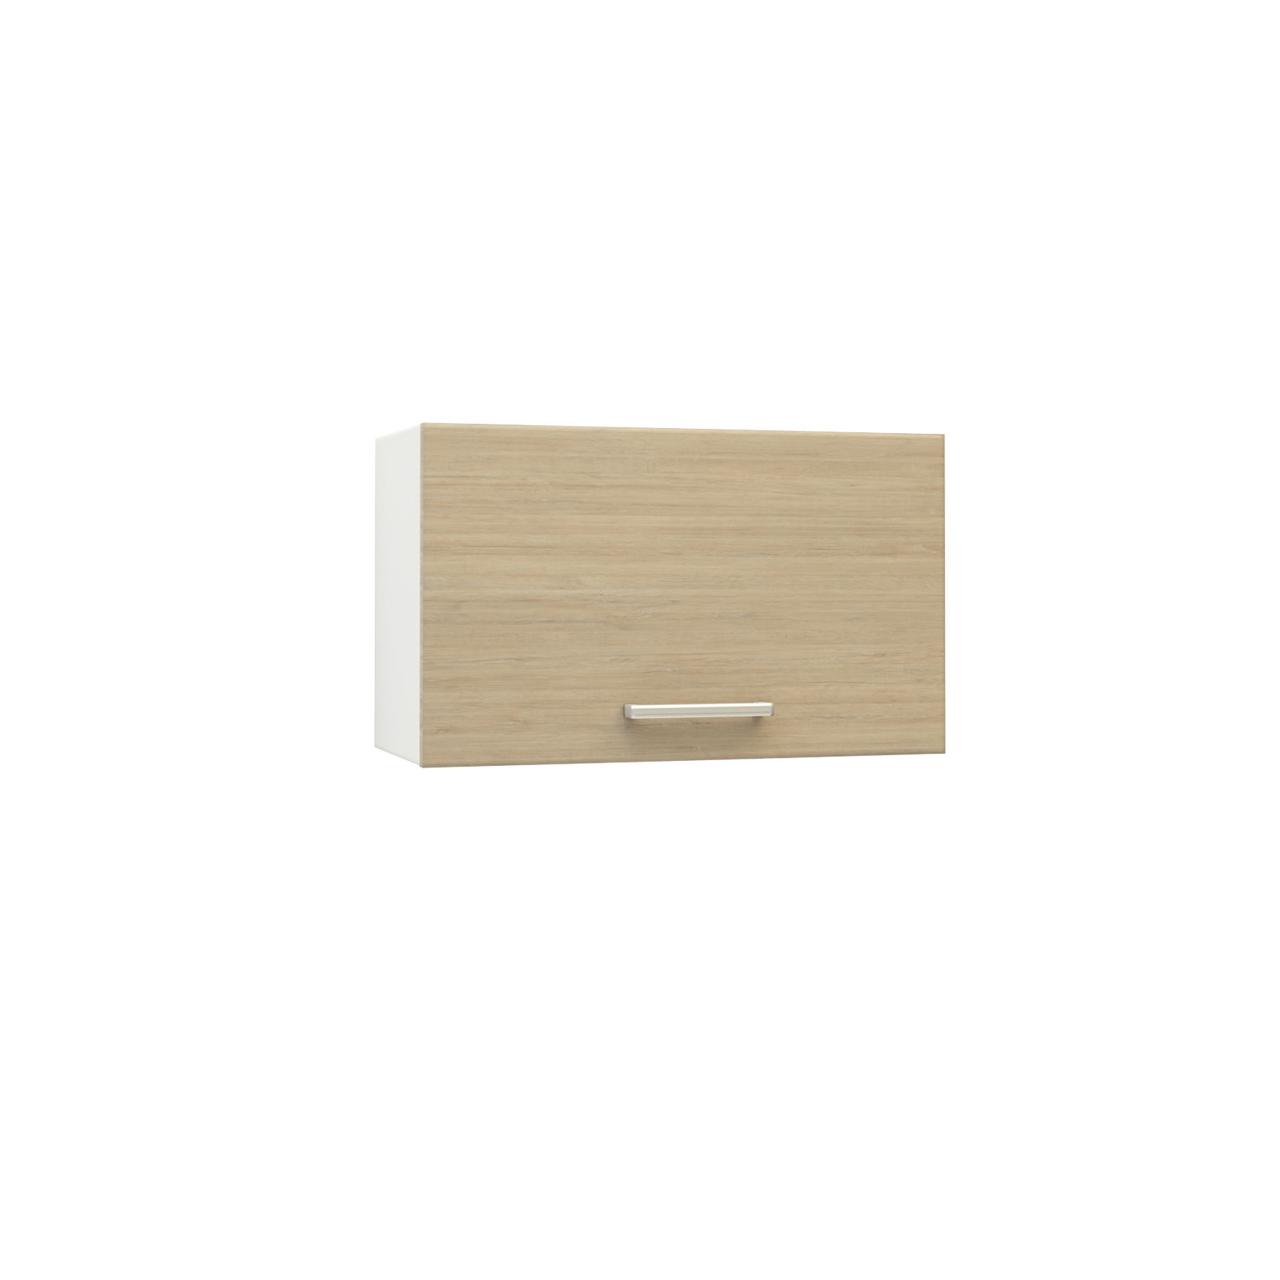 MEBLINE Skříňka horní W60 OKGR - Moreno picard